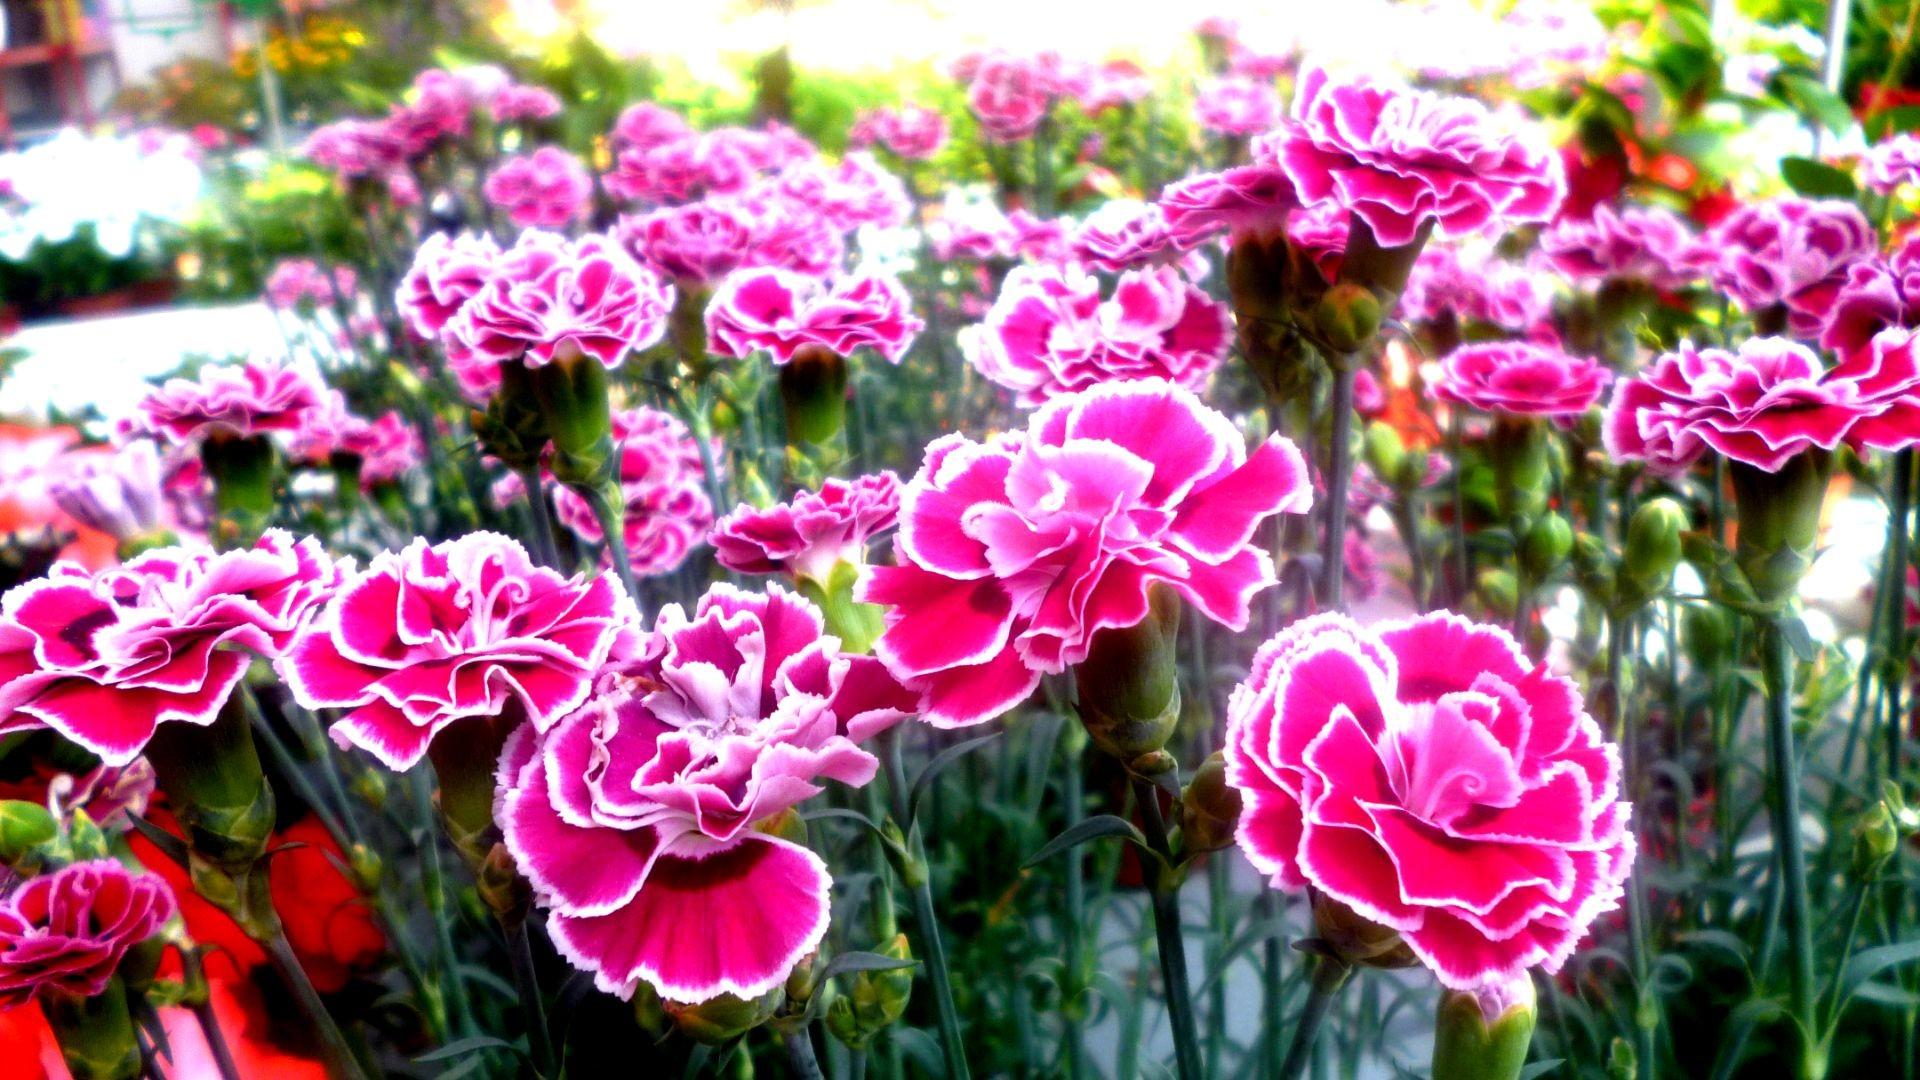 Trébol garden